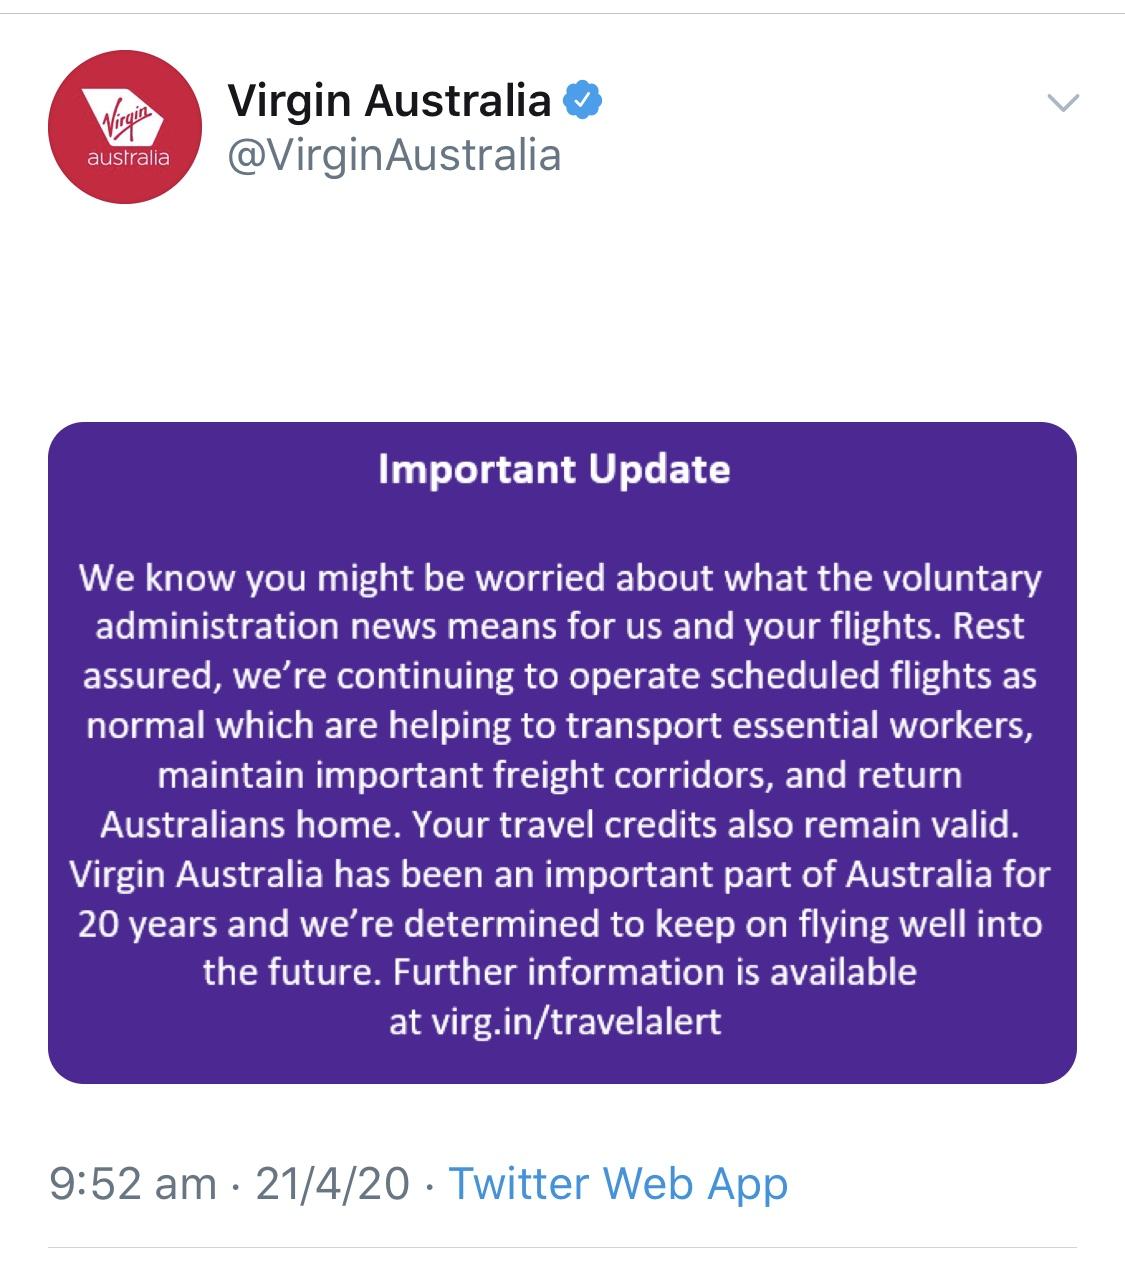 Virgin Australia Tweet